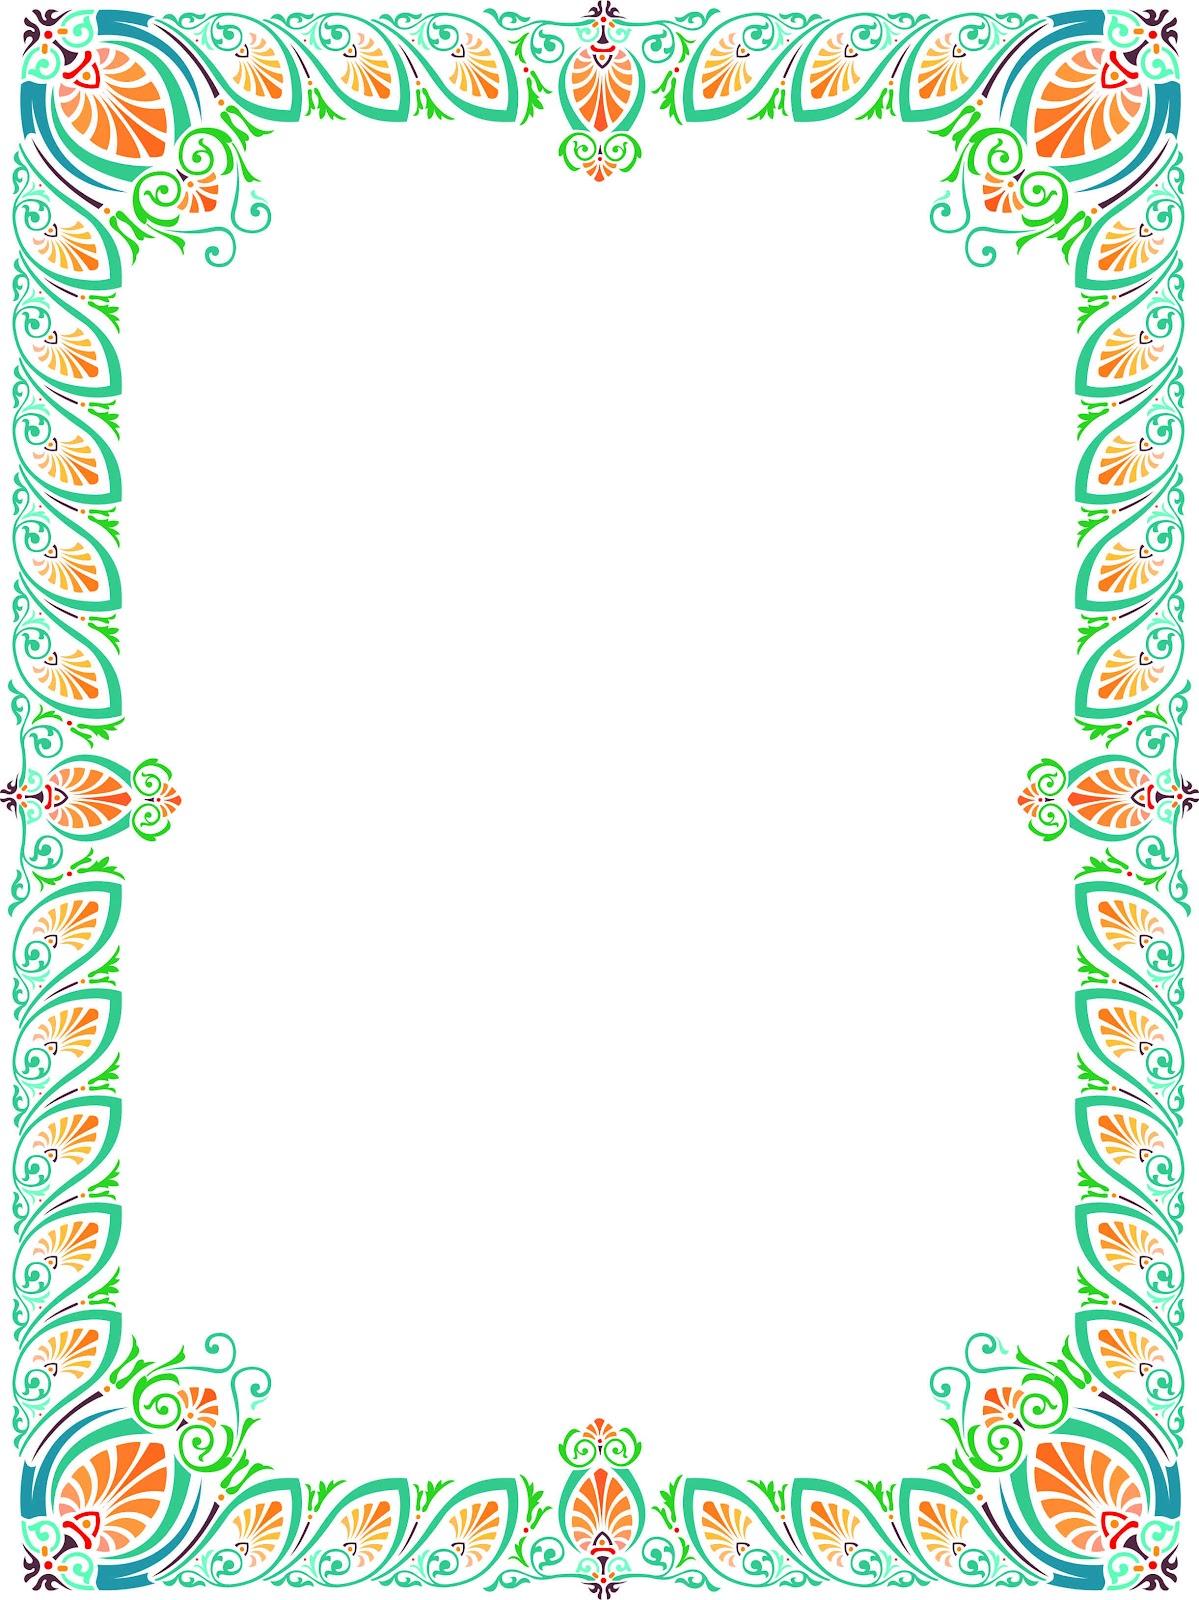 Bingkai dan beground indah » Bingkai Piagam 19